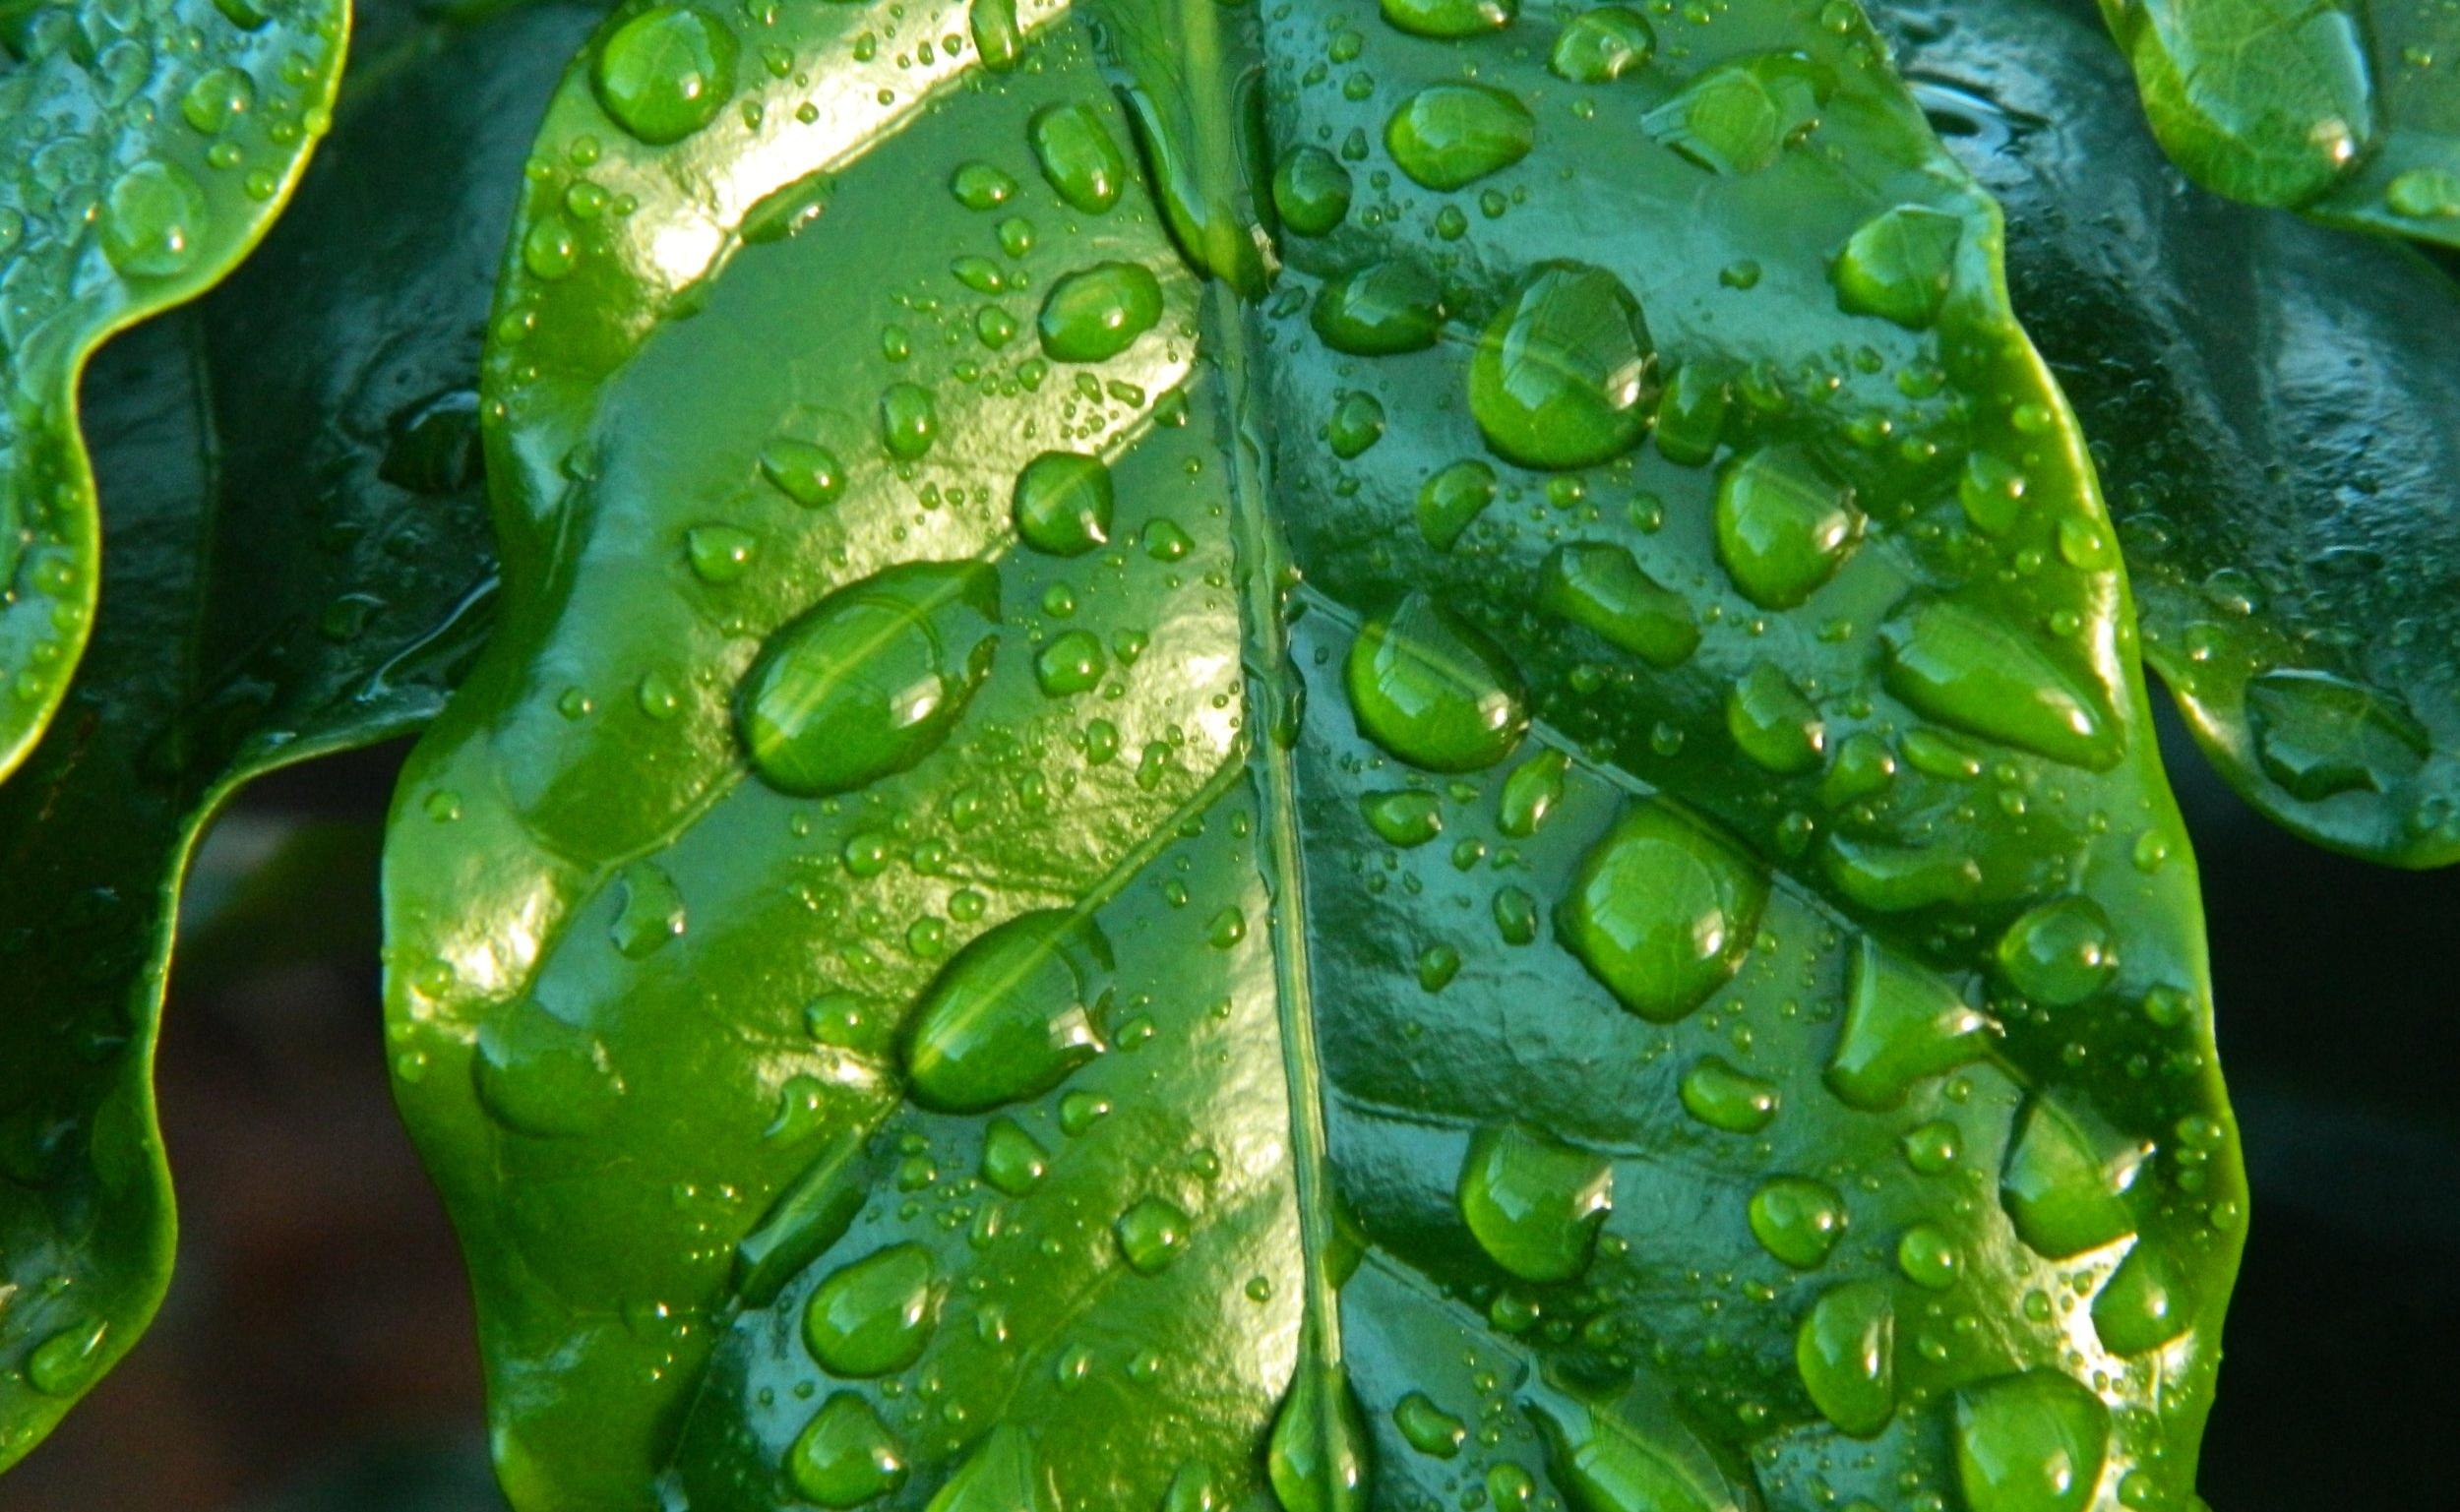 leaf-rain-coffee-water-38435.jpg